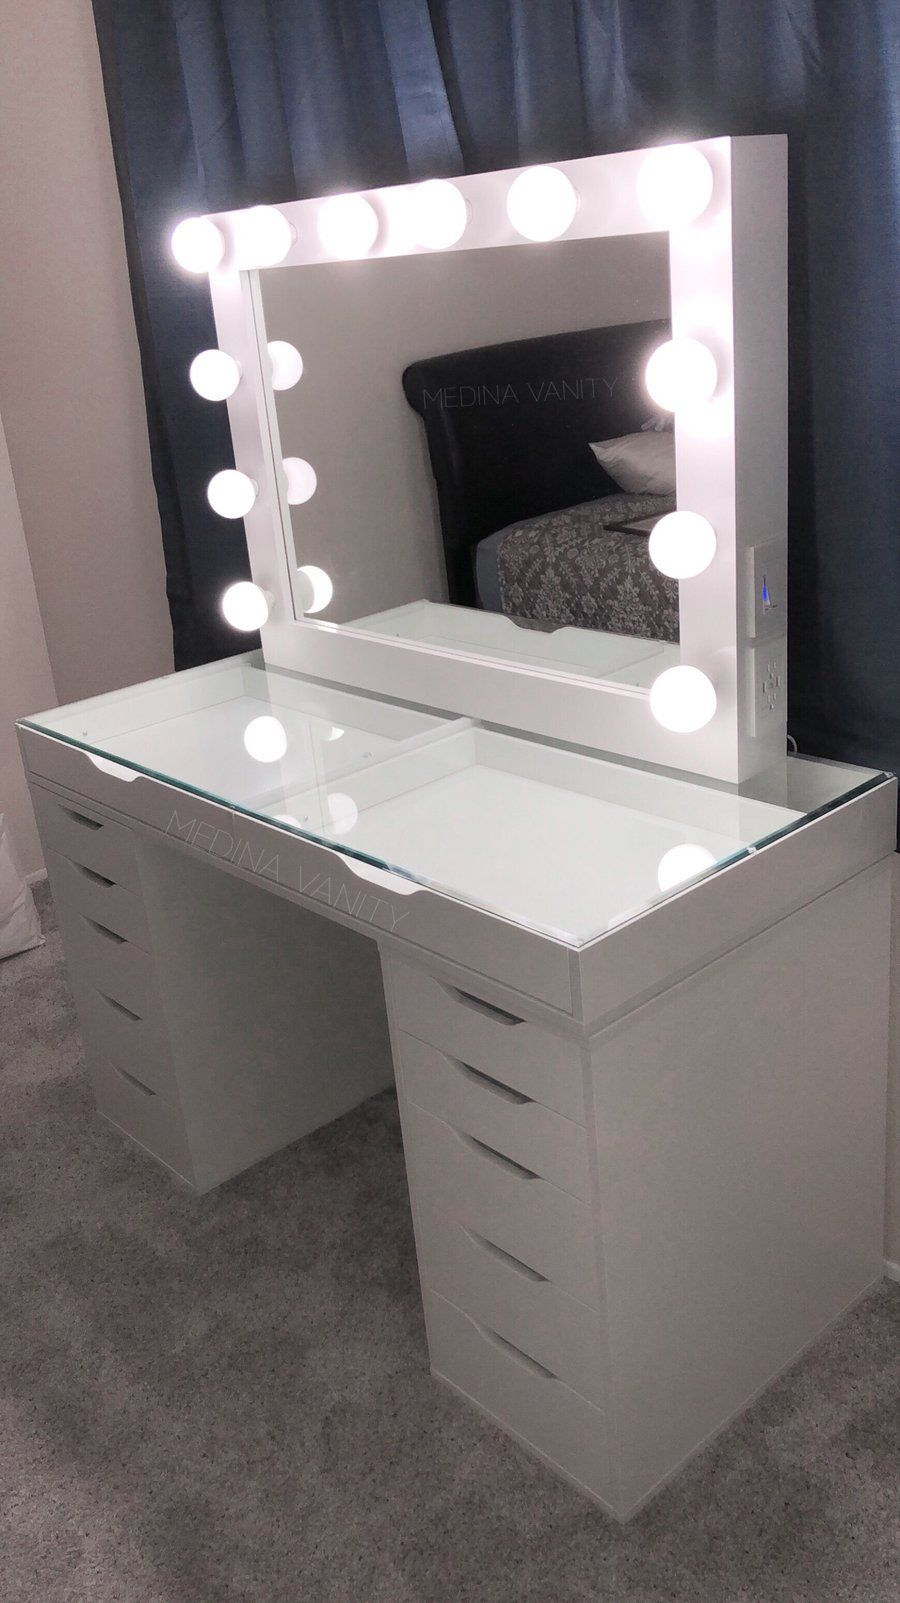 ZARA Vanity Table + 9 Dressers - Medina Vanity  Beauty room